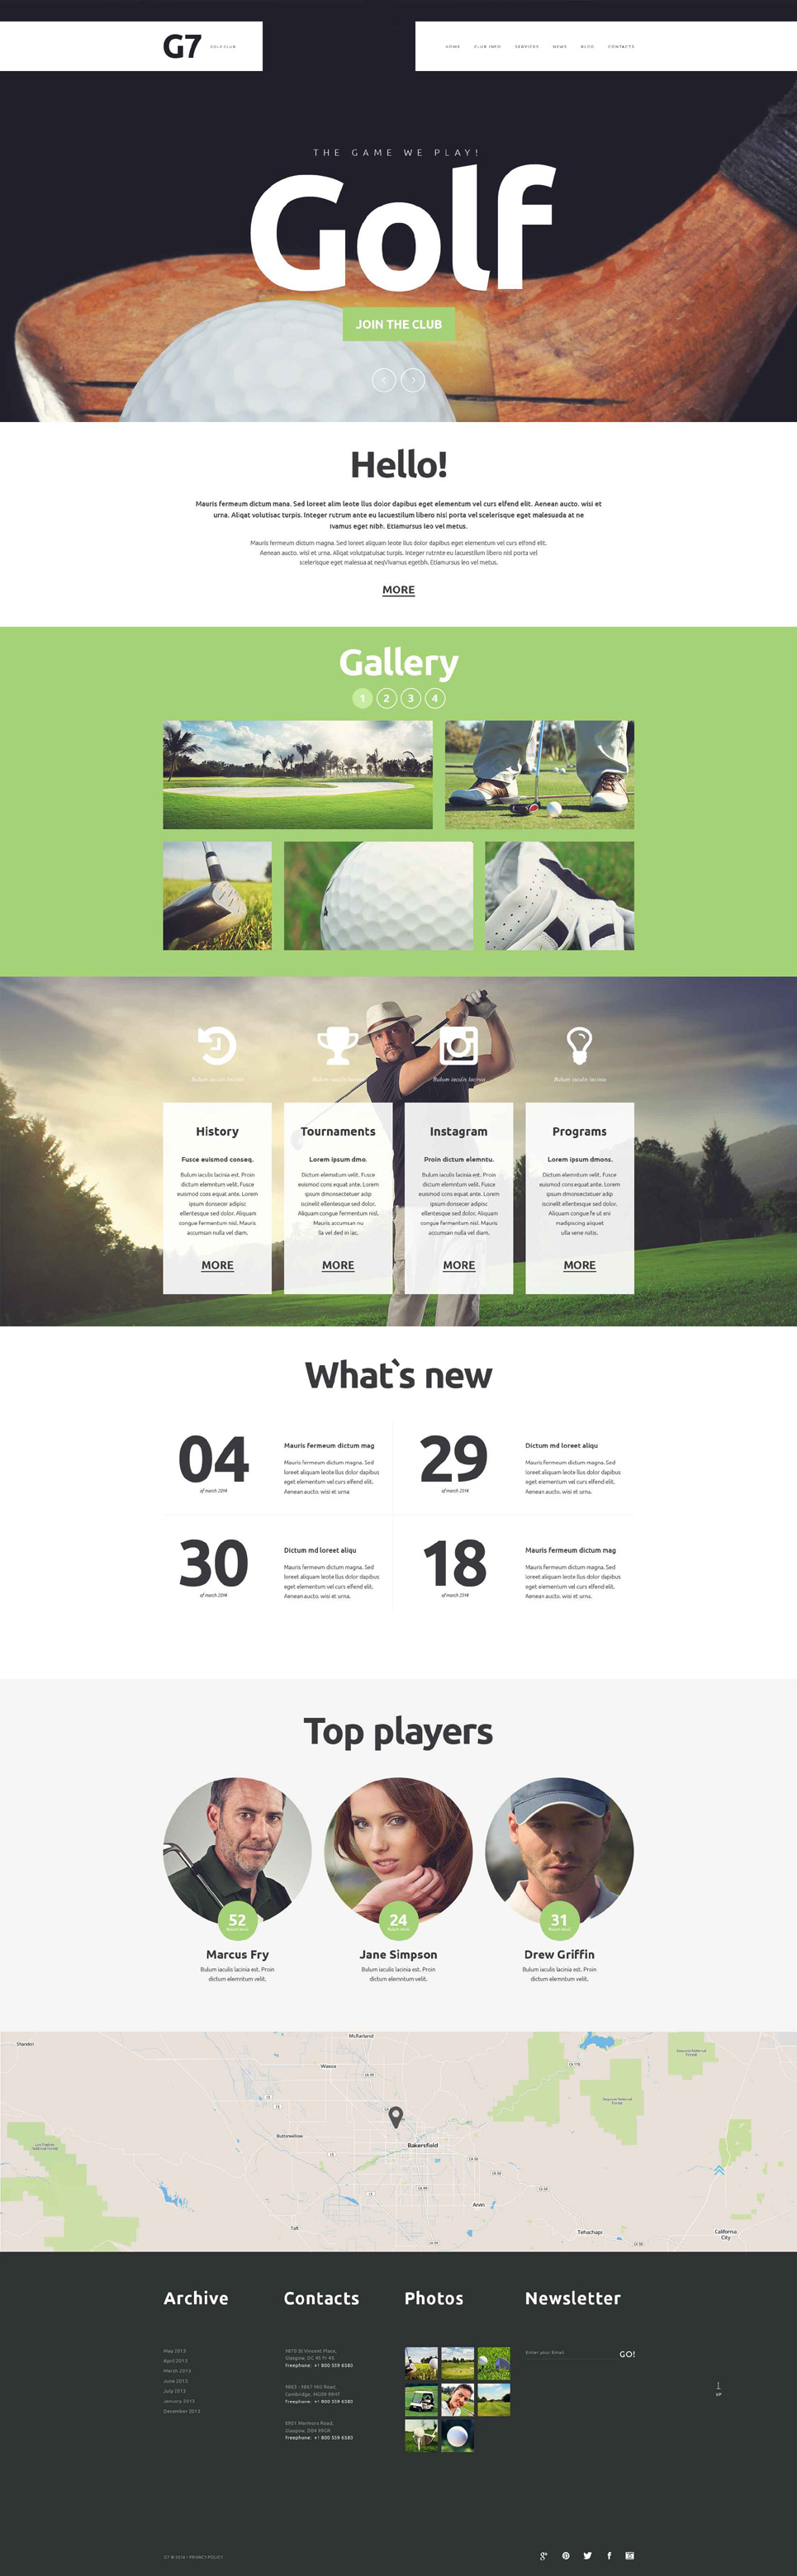 golf club website template 52364. Black Bedroom Furniture Sets. Home Design Ideas